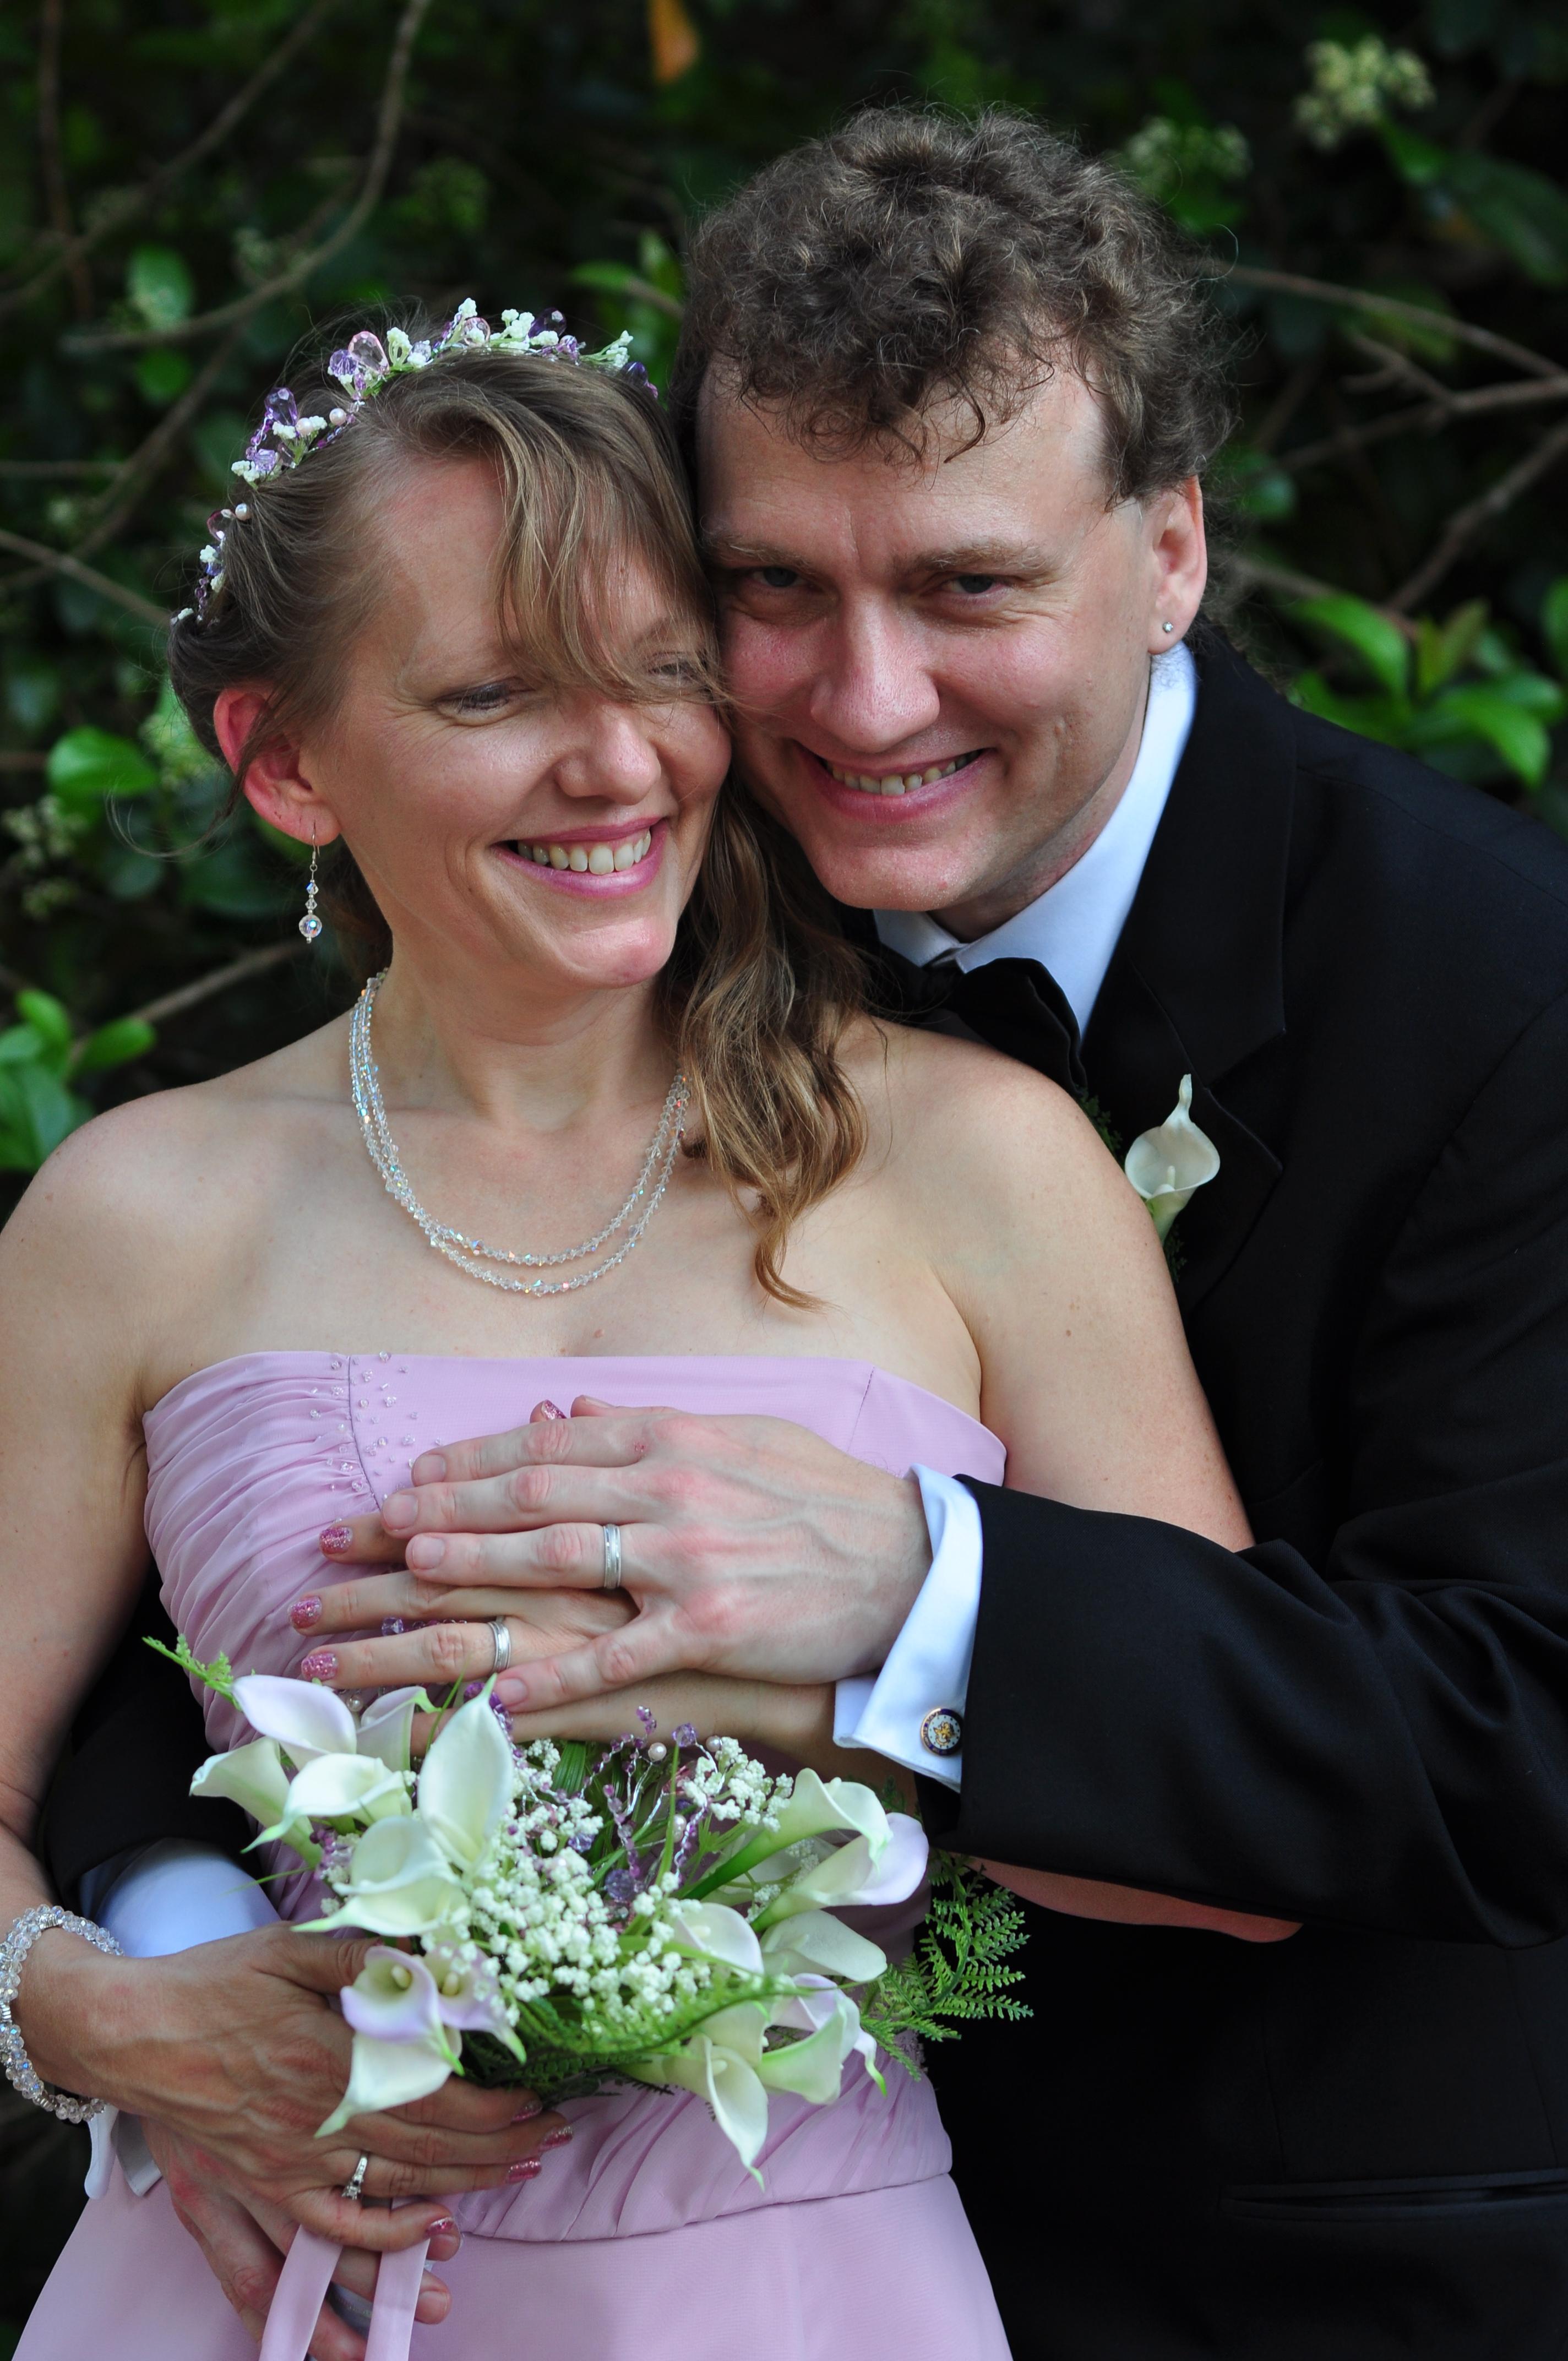 emily-and-travis-4-1-2013-april-fools-wedding-463